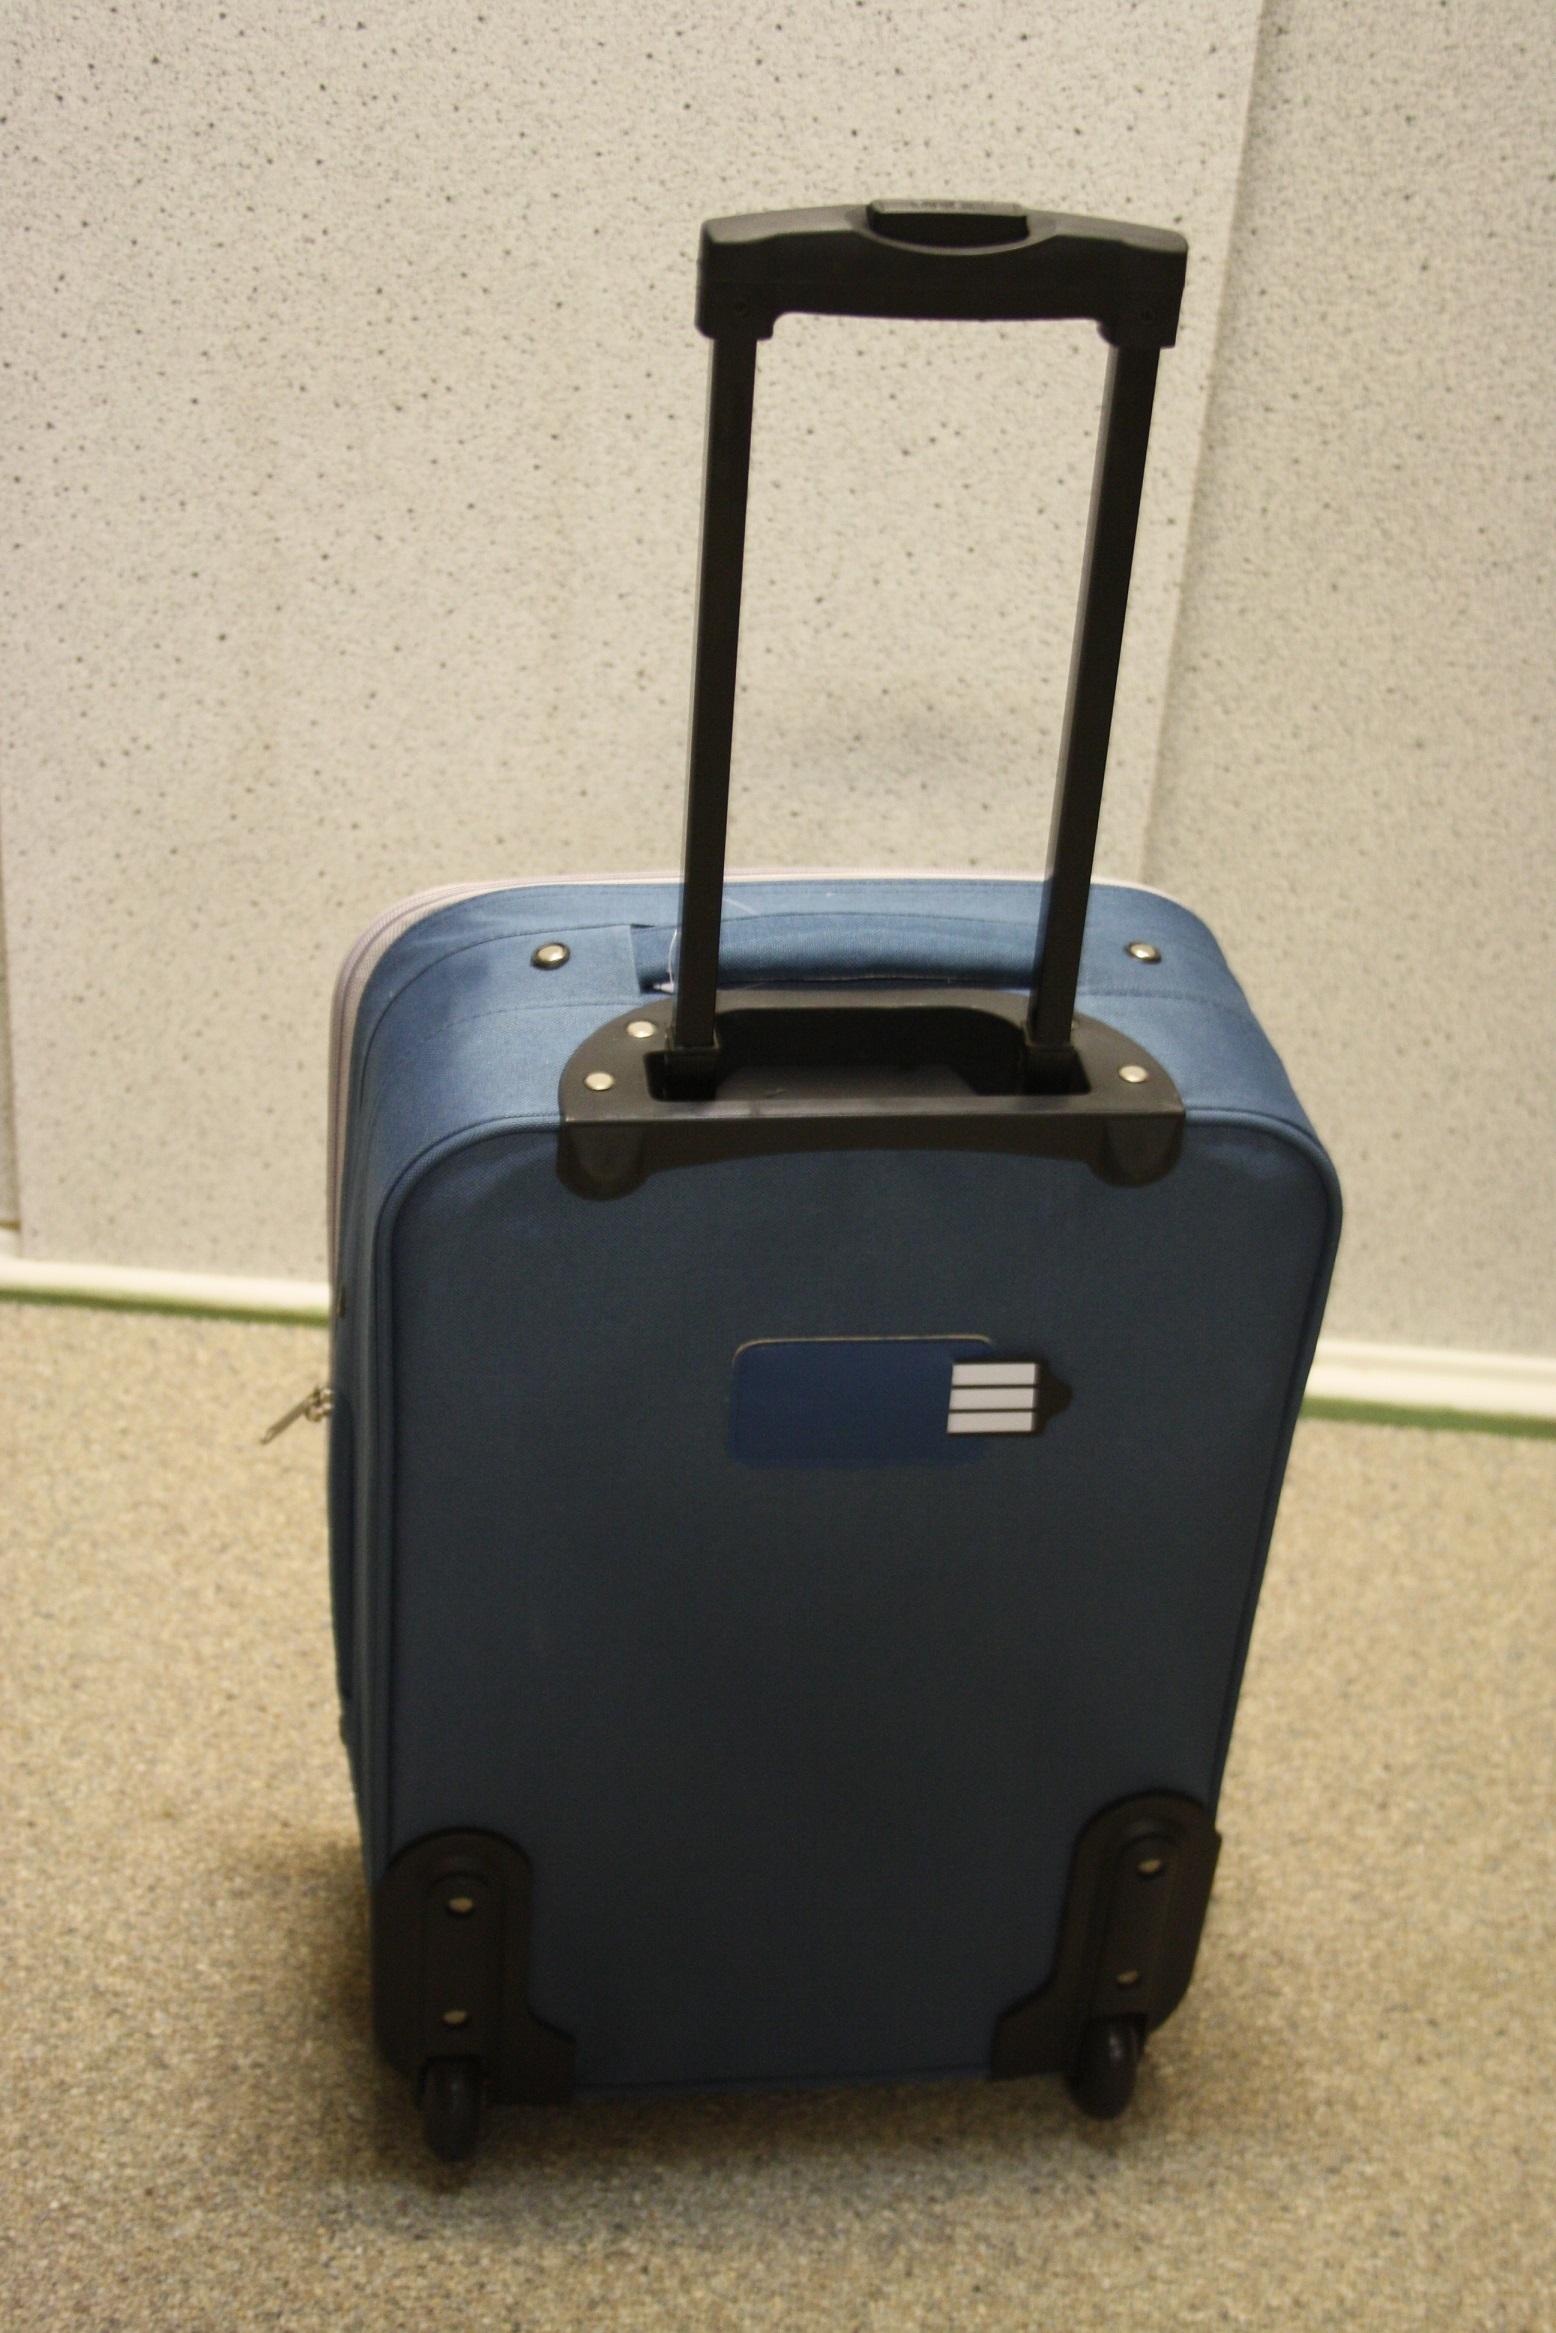 Ongekend AKTIE!!! Handbagage Leonardo-spilbergen-spec NU rood-zwart-blauw UE-77